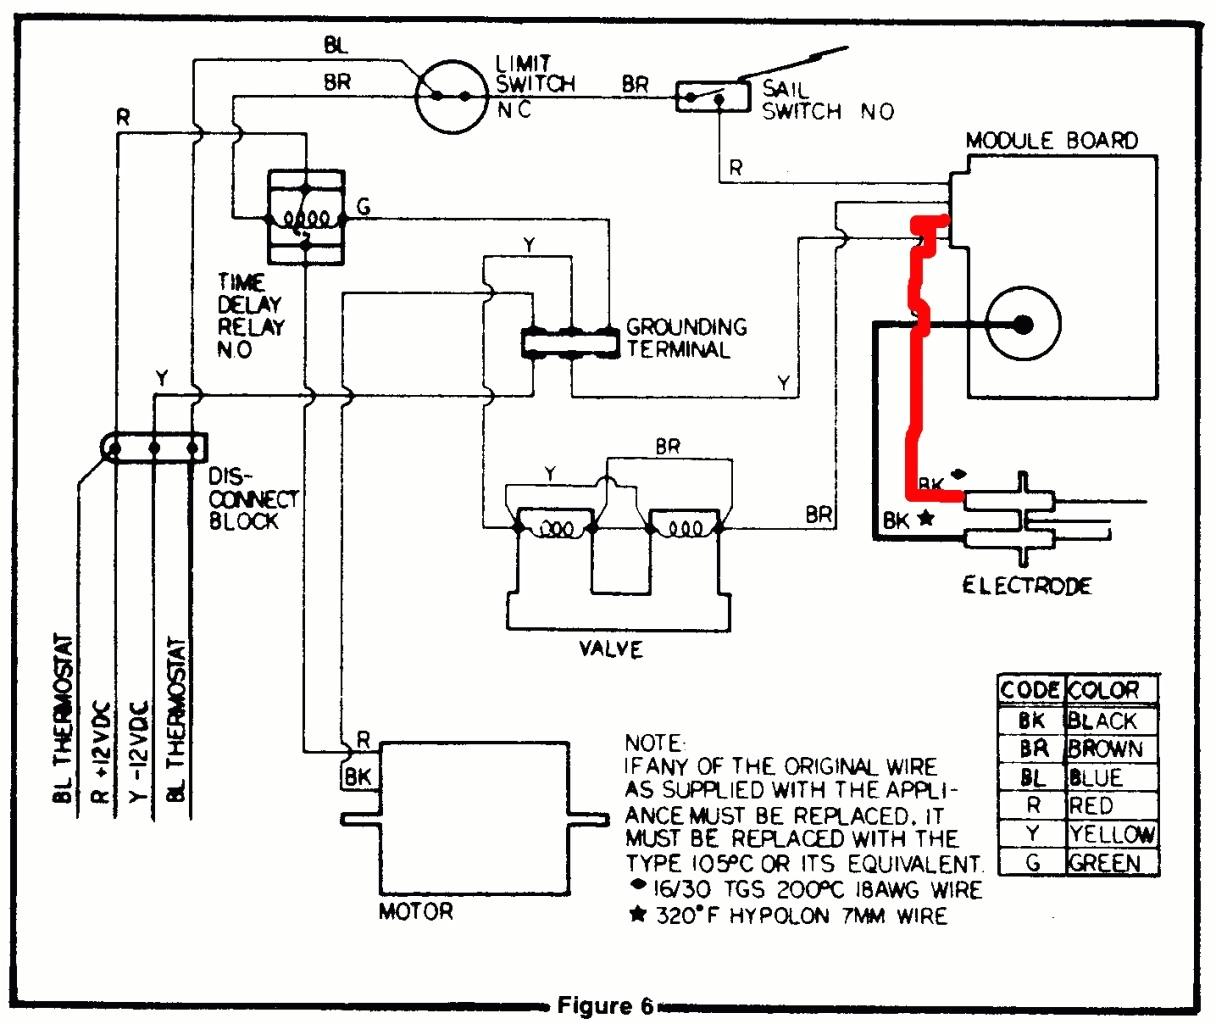 atwood water heater wiring diagram free wiring diagram wiring diagram also on rv water heater get free image about wiring